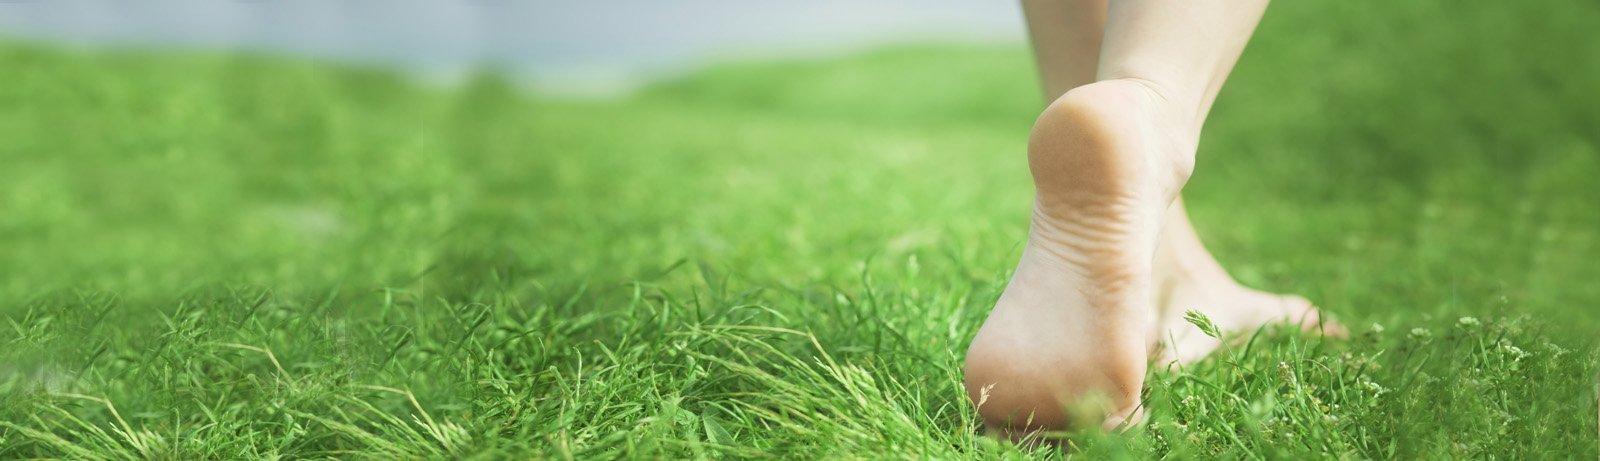 slider_grass